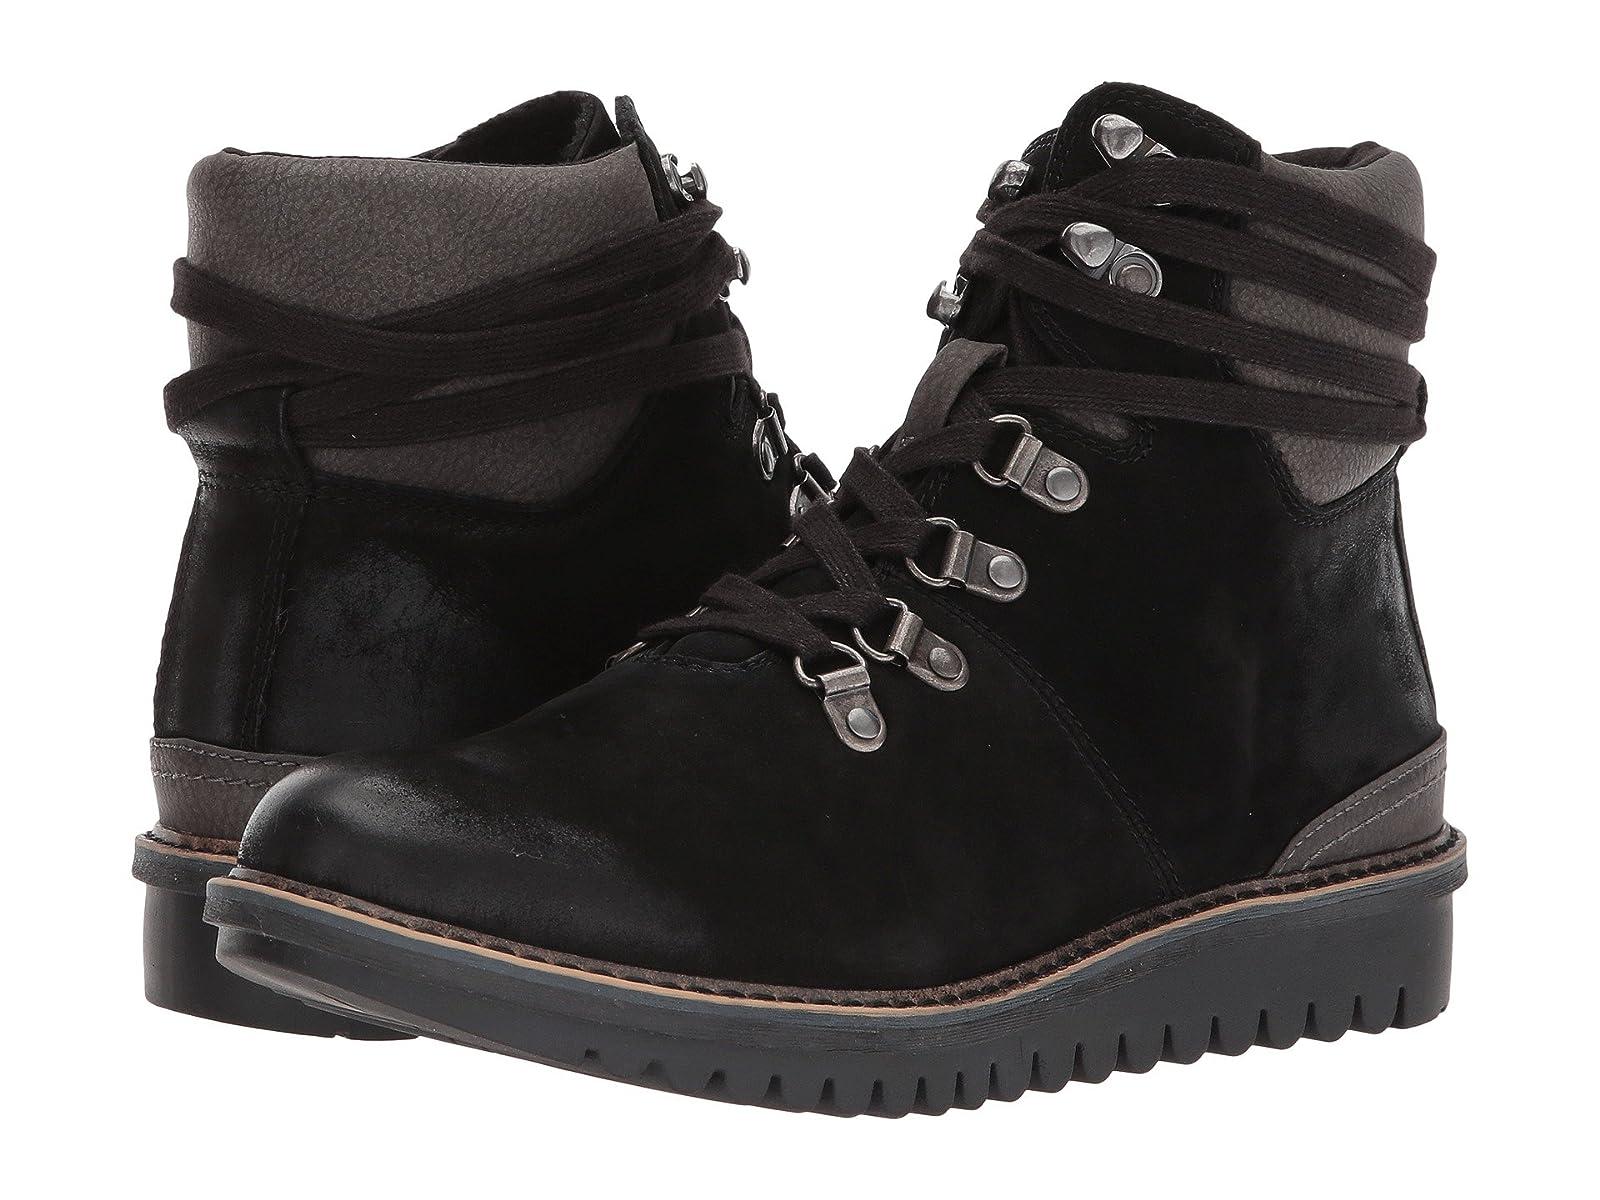 Tamaris Sapele 1-1-25214-29Cheap and distinctive eye-catching shoes